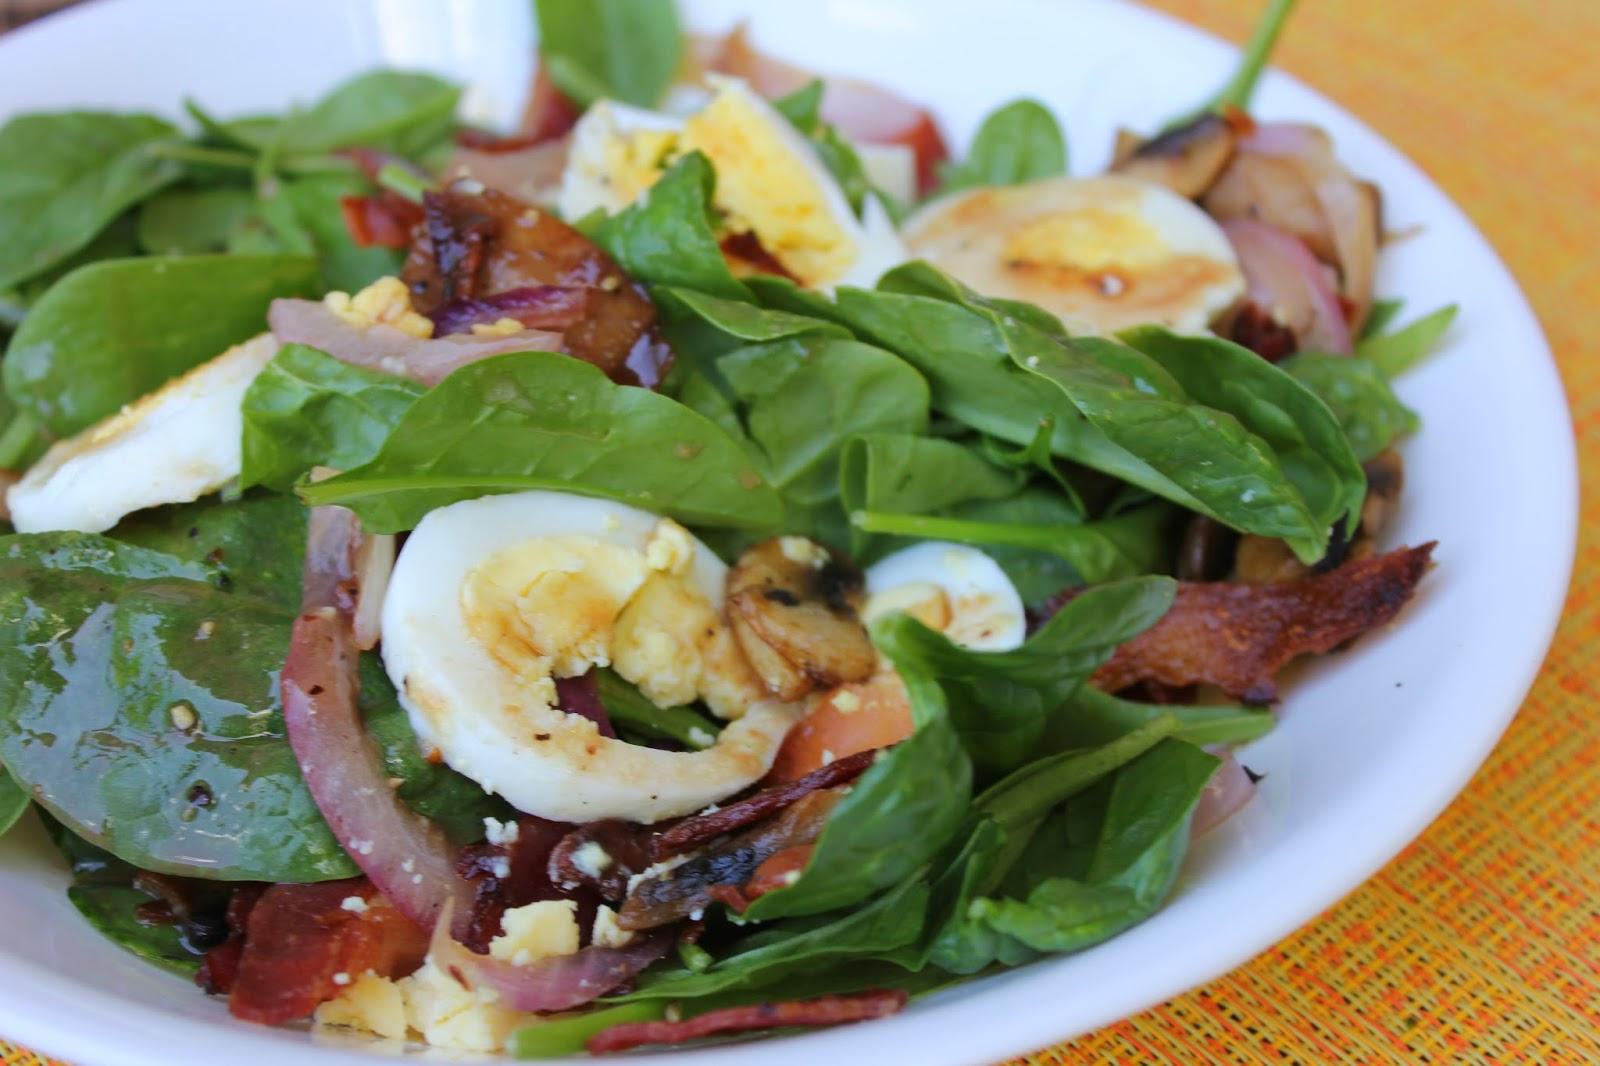 Recipe:  Salad, Recipe:  Vegetable, Recipe:  Side Dishes, Recipe:  Pork, Warm Spinach Bacon Salad, Pioneer Woman Recipe, Deals to Meals,